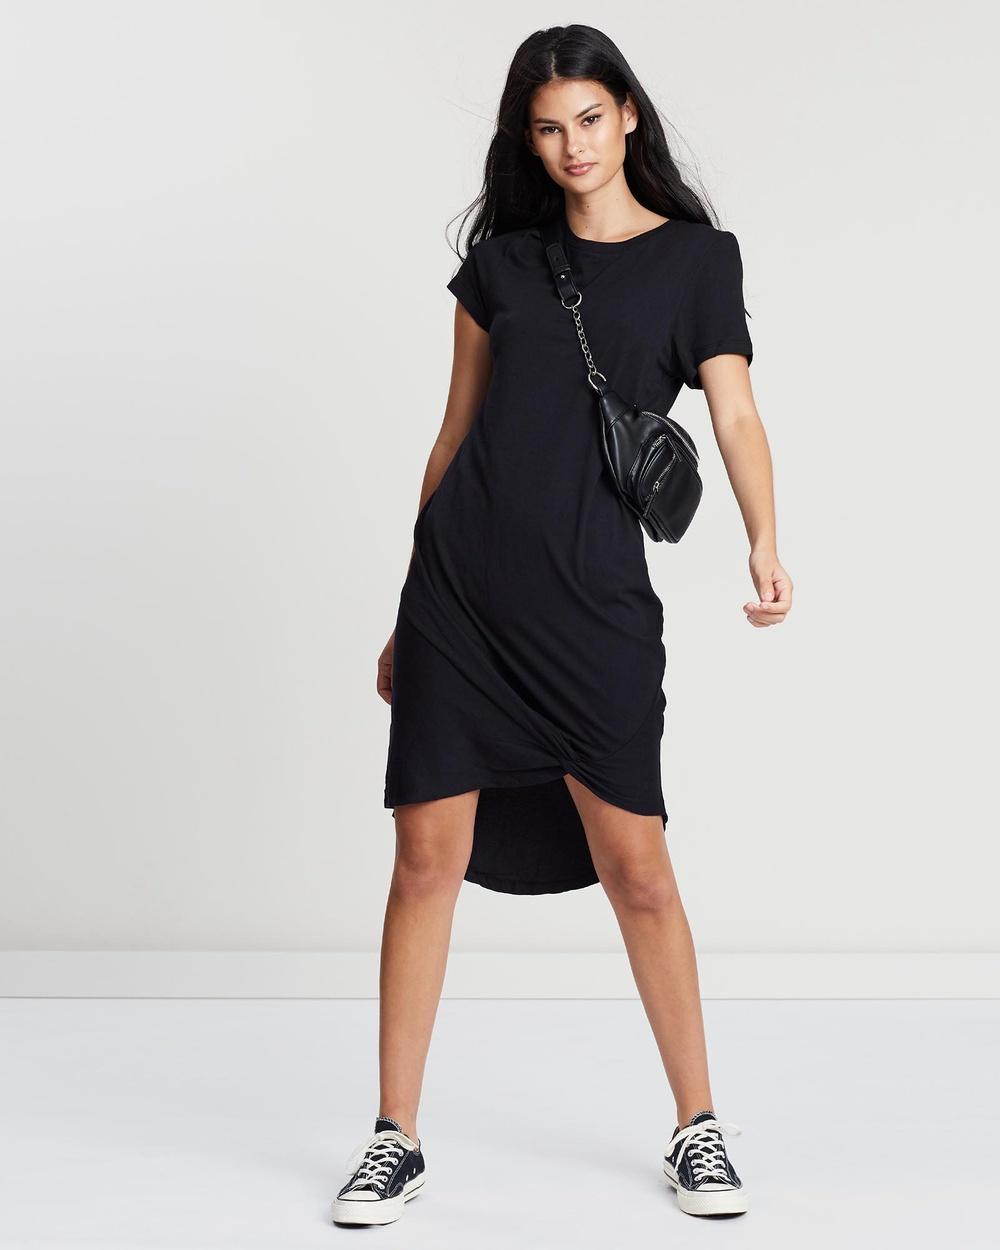 Silent Theory - Twisted Tee Dress Dresses (BLACK)